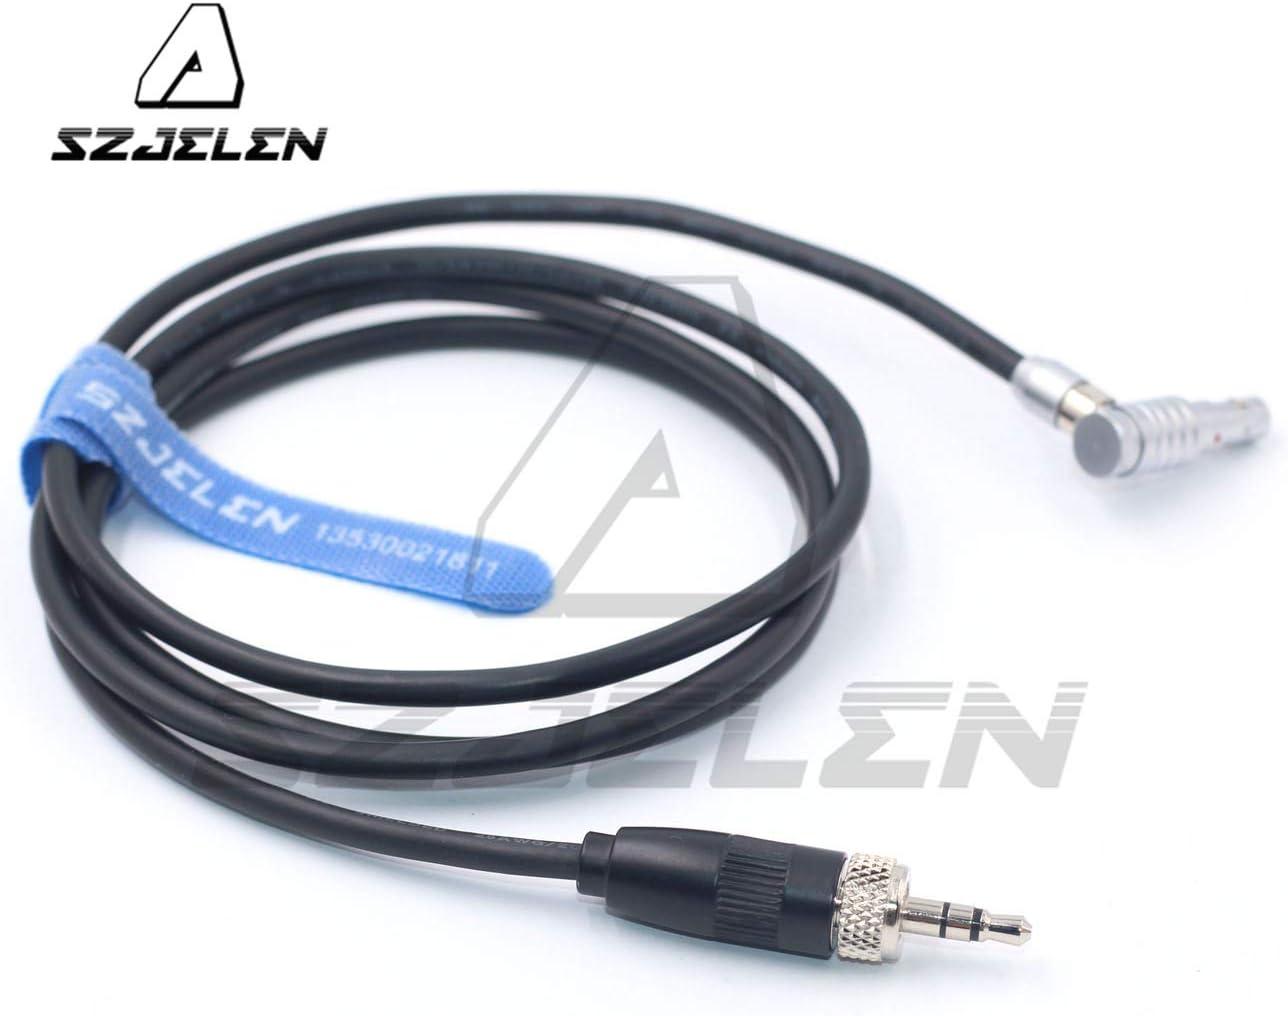 SZJELEN Right Angle 00B 5pin to 3.5mm Audio Plug for Arri Alexa Mini Audio Cable